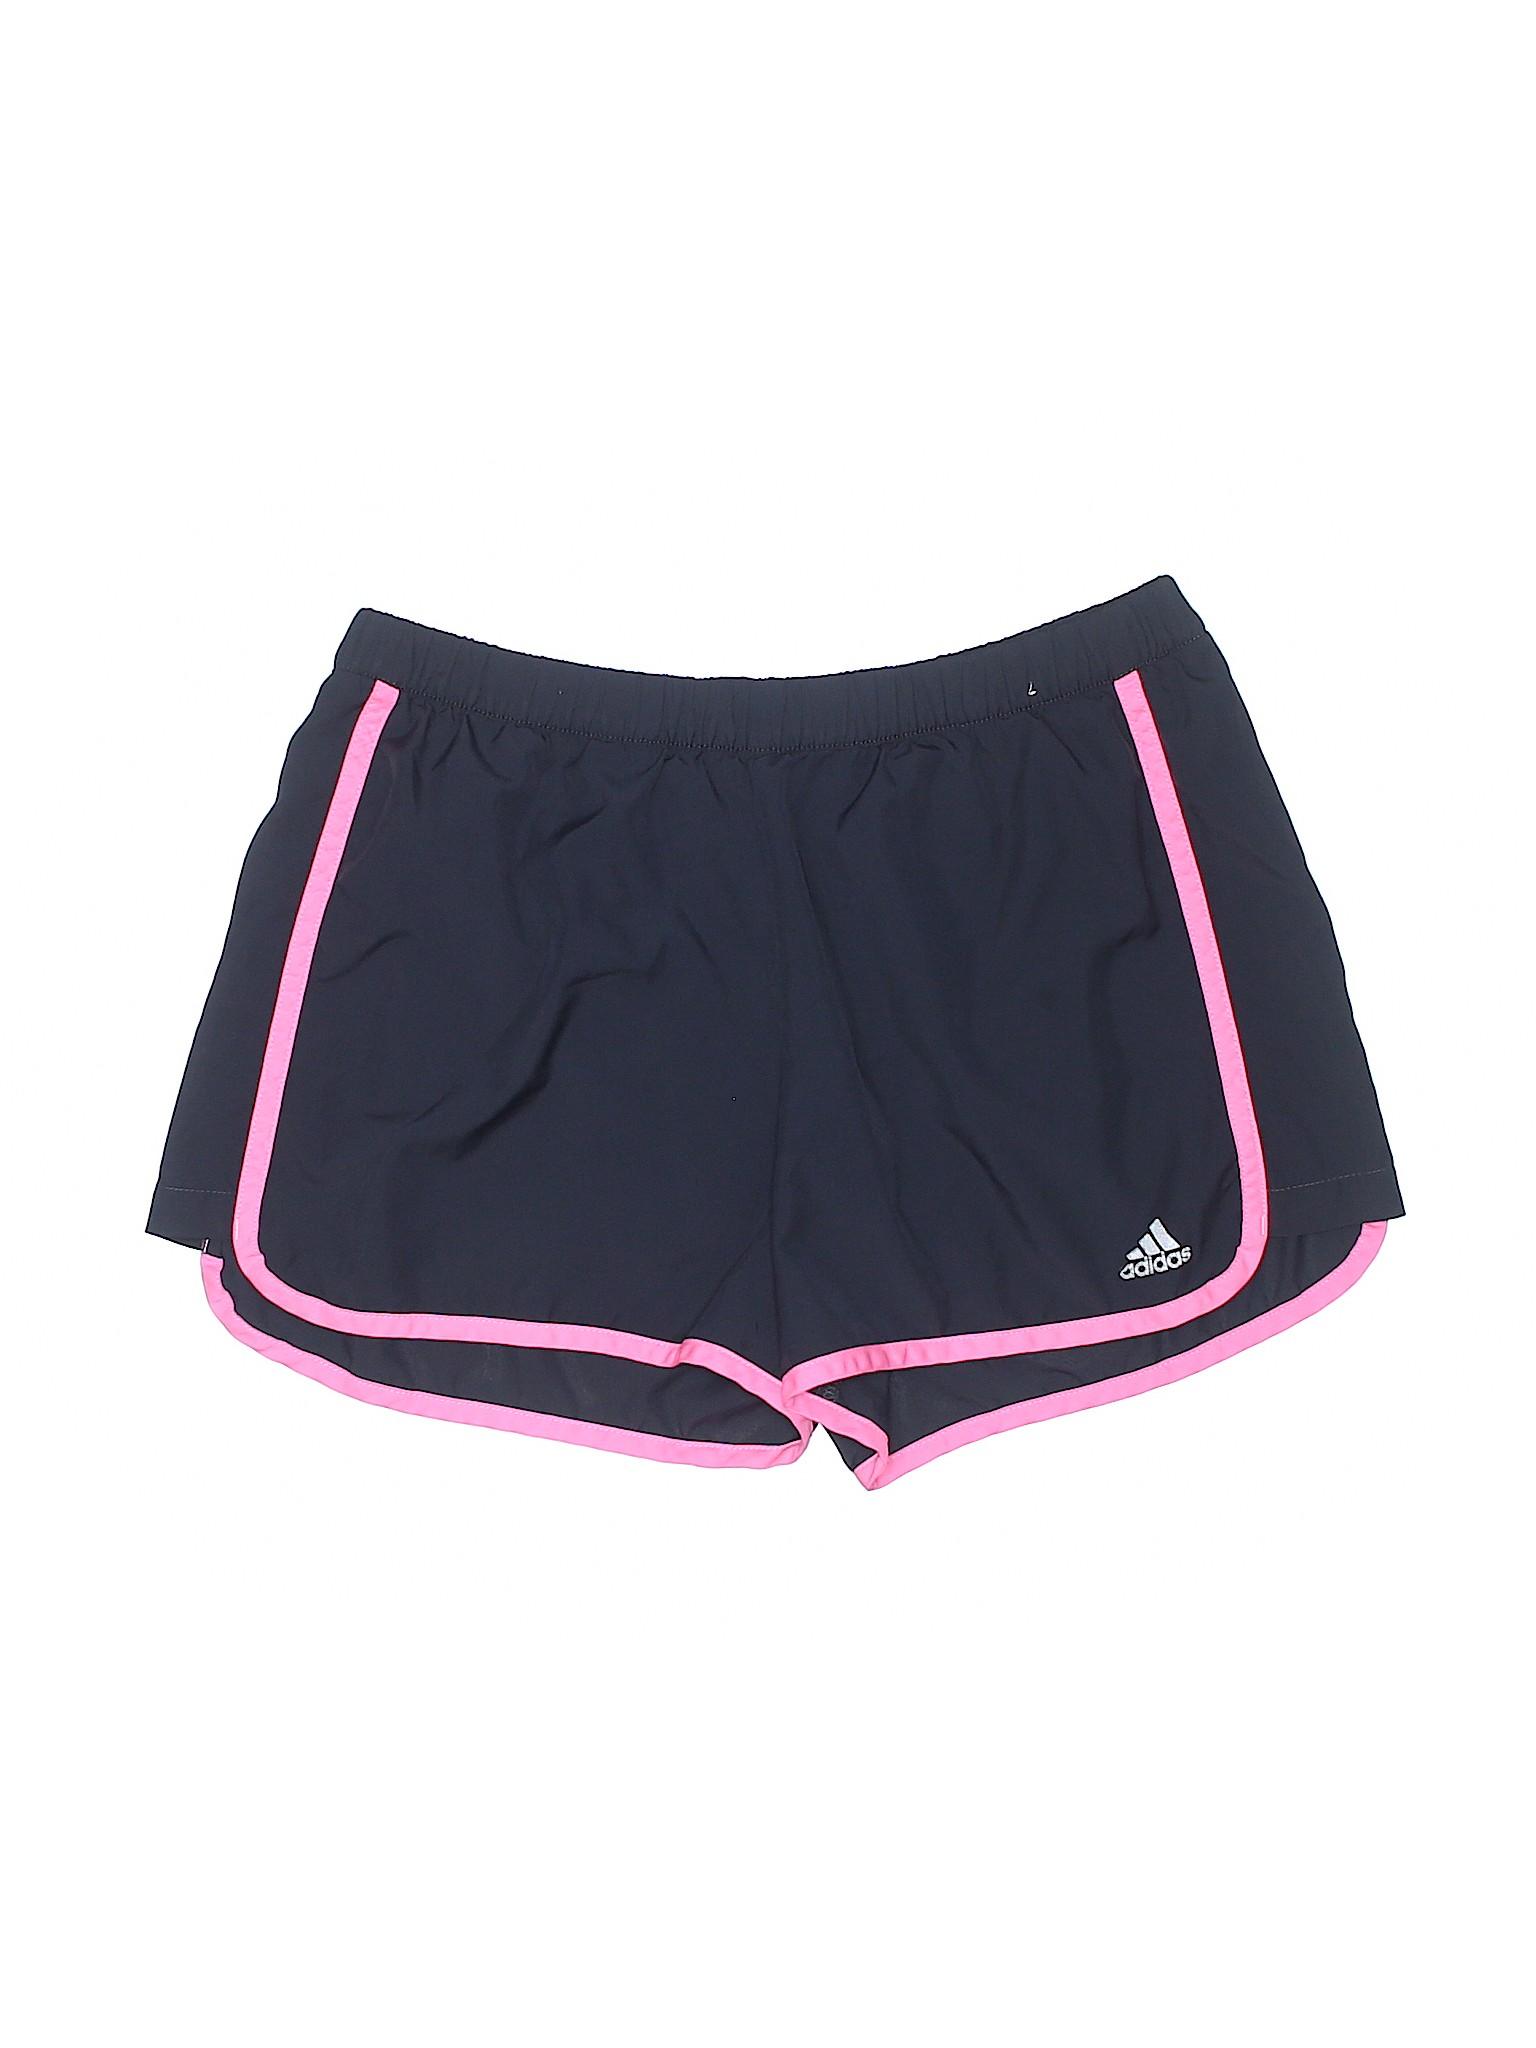 Boutique Winter Adidas Shorts Adidas Athletic Athletic Shorts Boutique Boutique Winter wwHxr5qOd